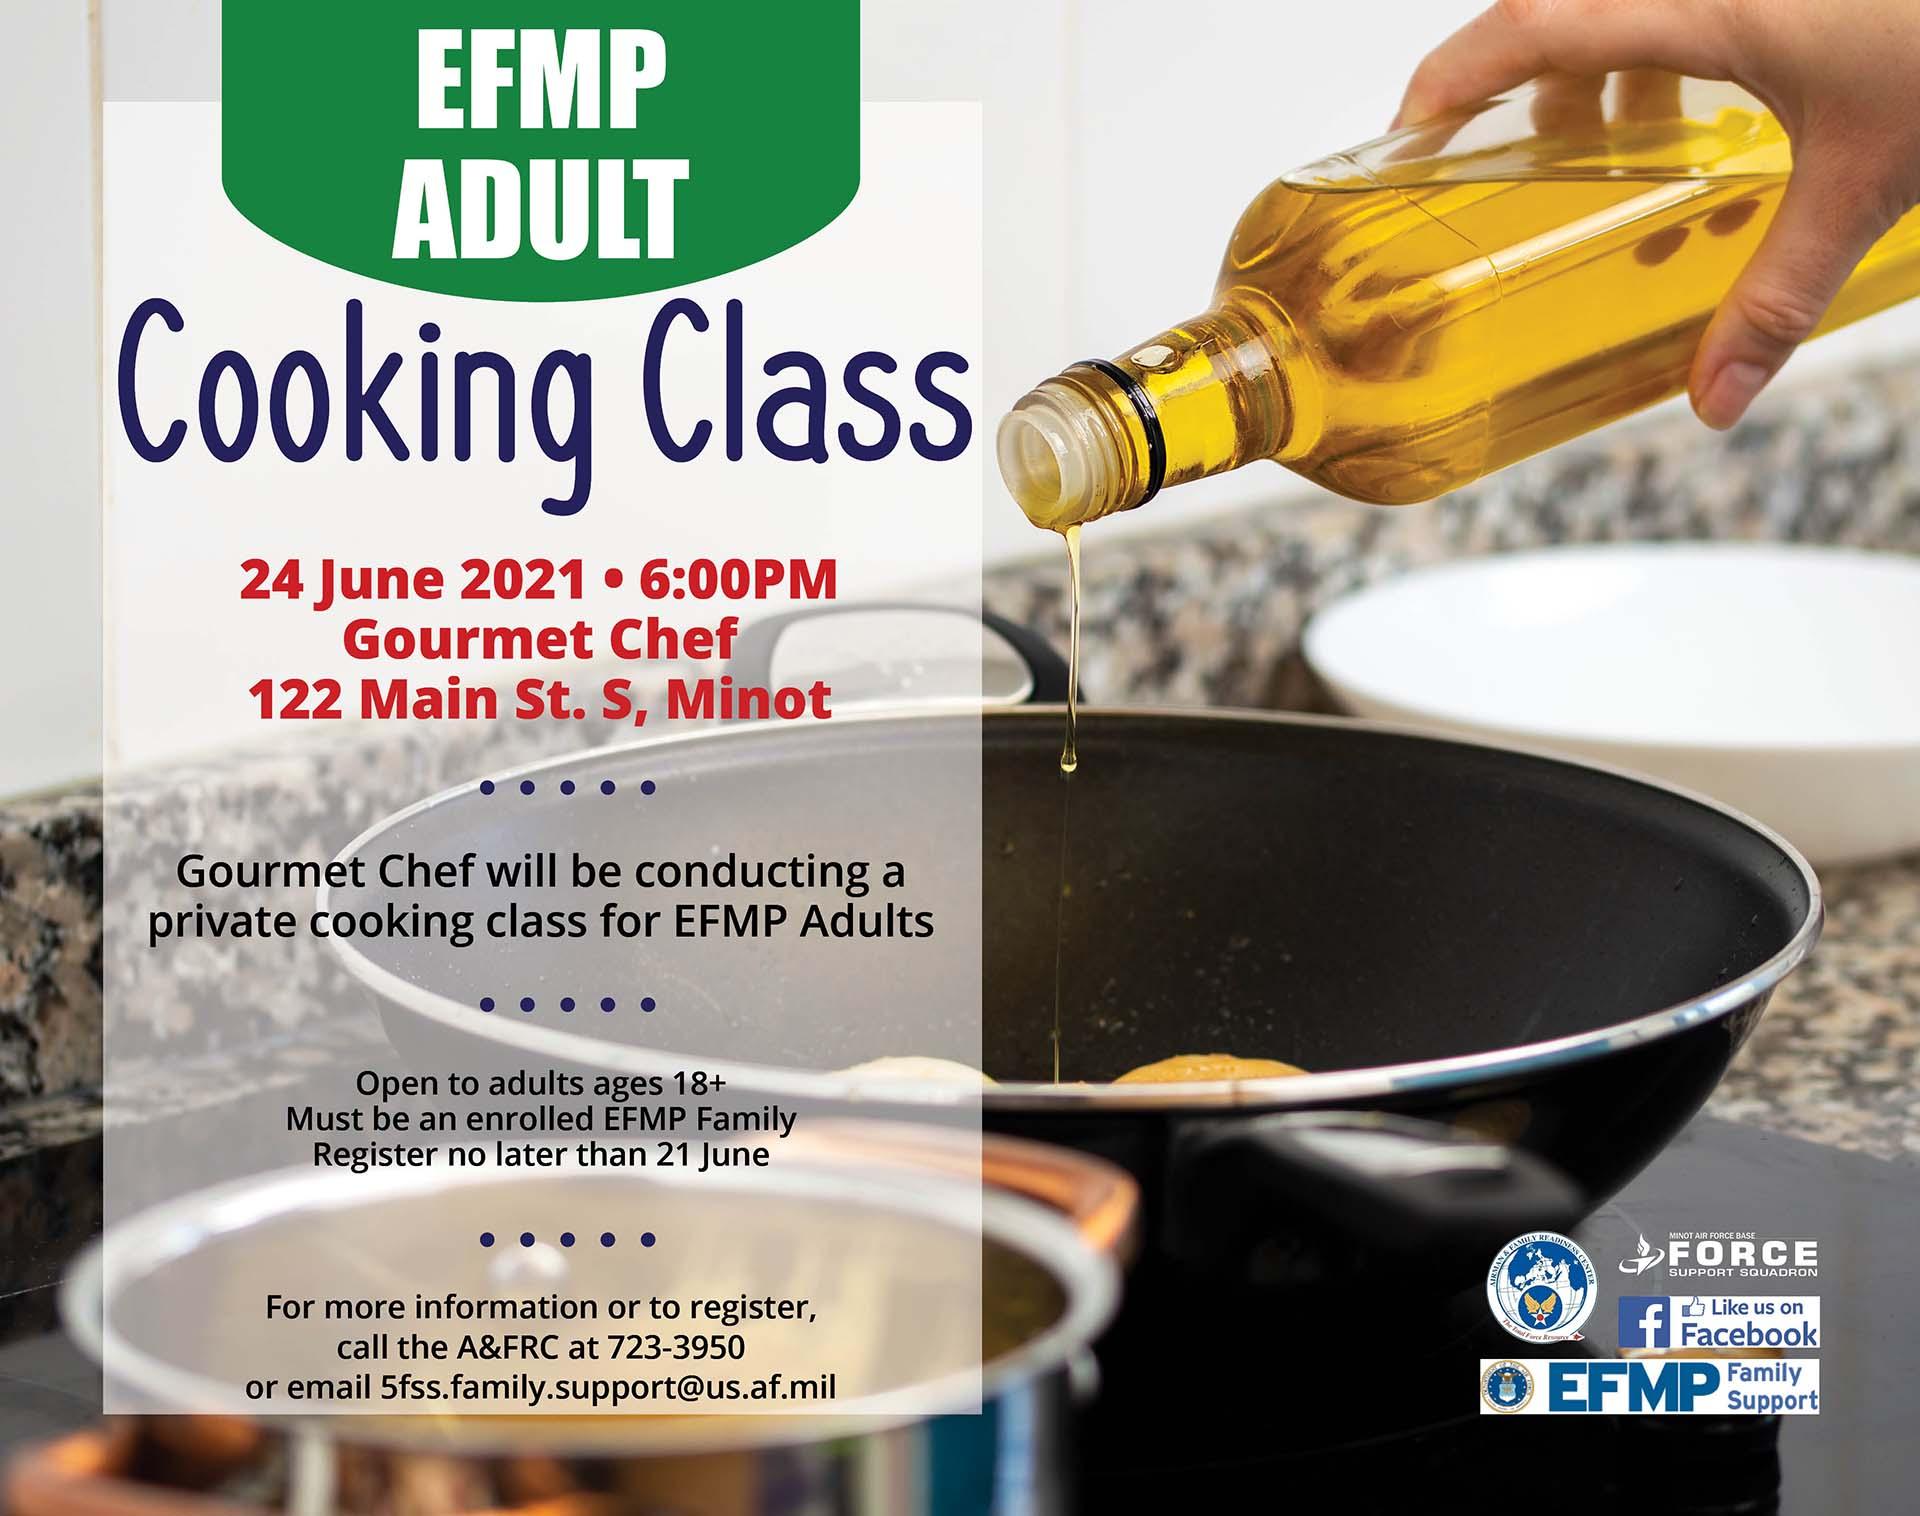 EFMP Adult Cooking Class